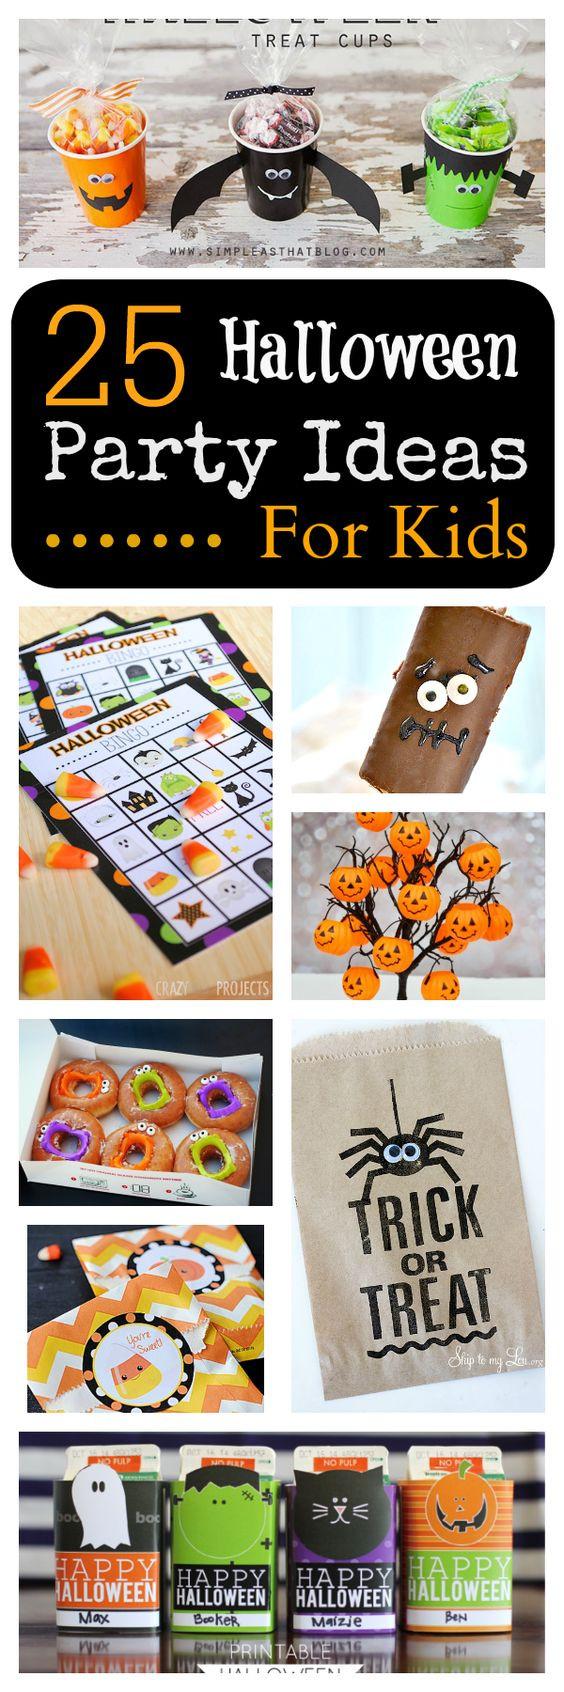 Halloween School Party Ideas  25 School Halloween Party Ideas for Kids